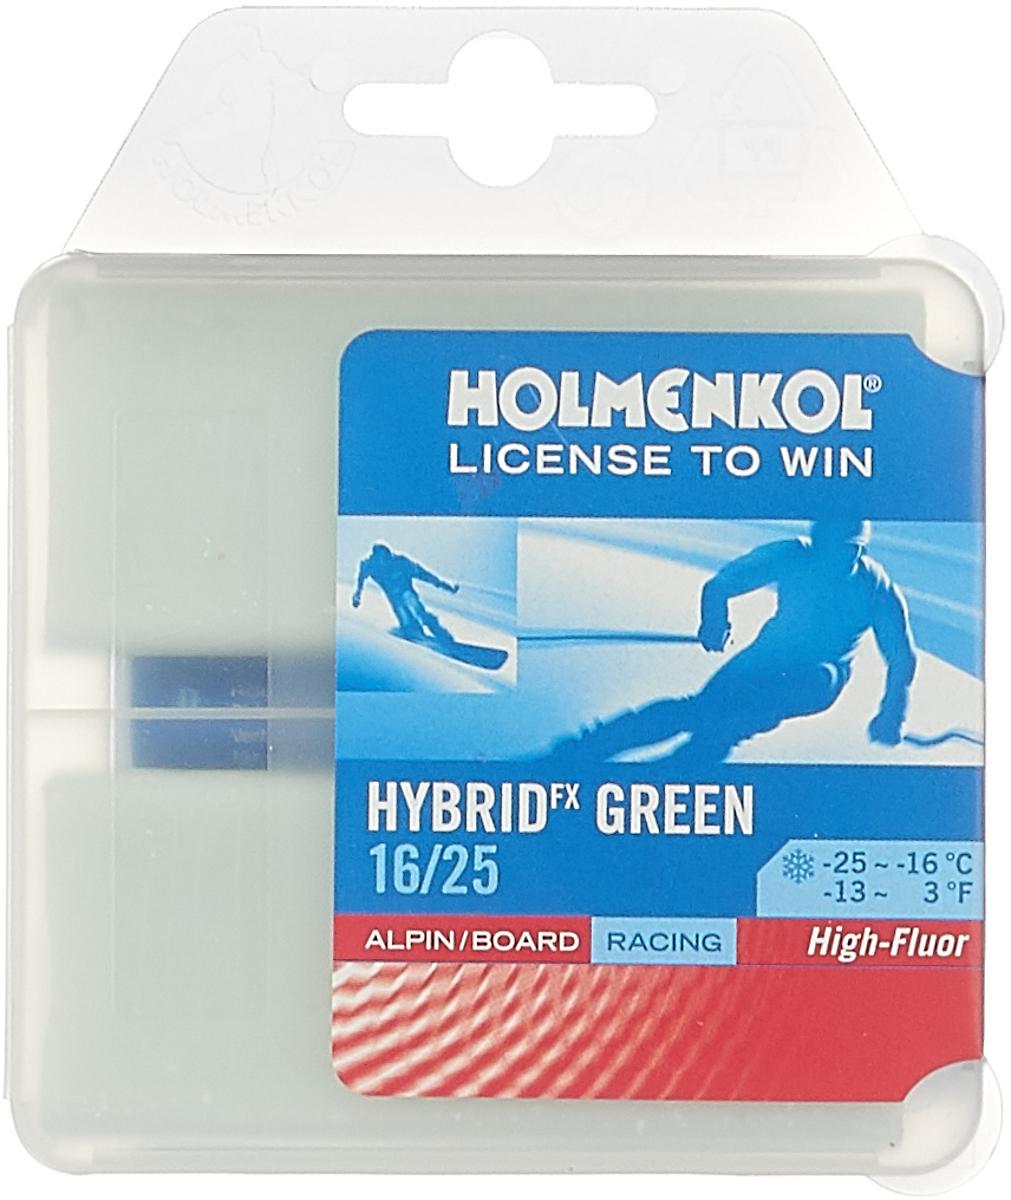 Парафин Holmenkol HF Hybrid Green, высокофторовый, -16…-25C, 2 x 35 г парафин holmenkol alphamix weltcup skiwax 1x150g желтый 150g